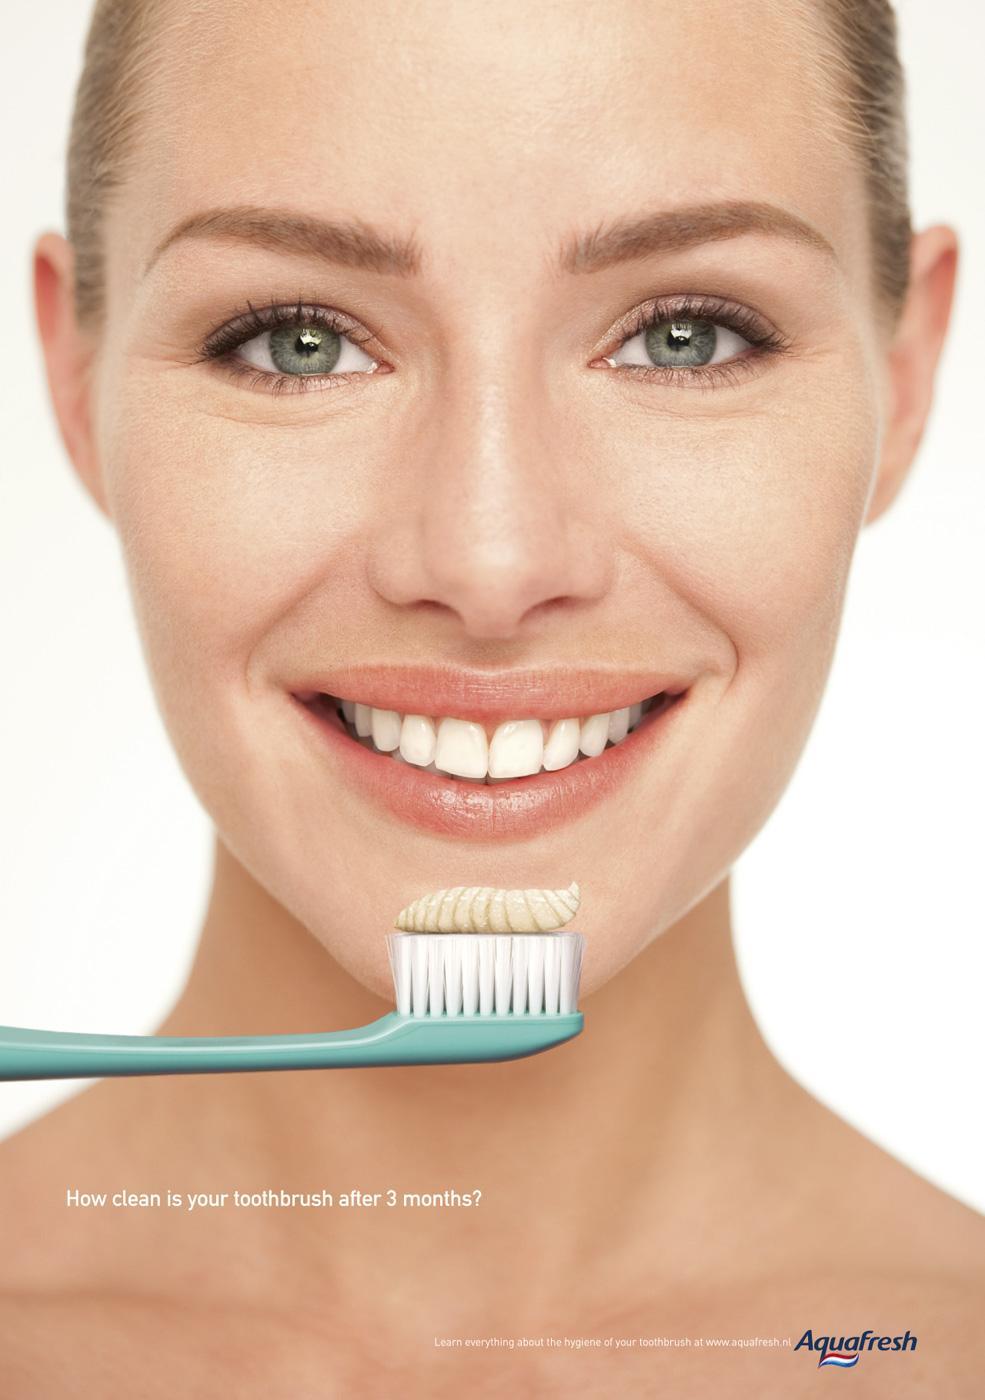 Aquafresh Print Ad -  Dirty toothbrush